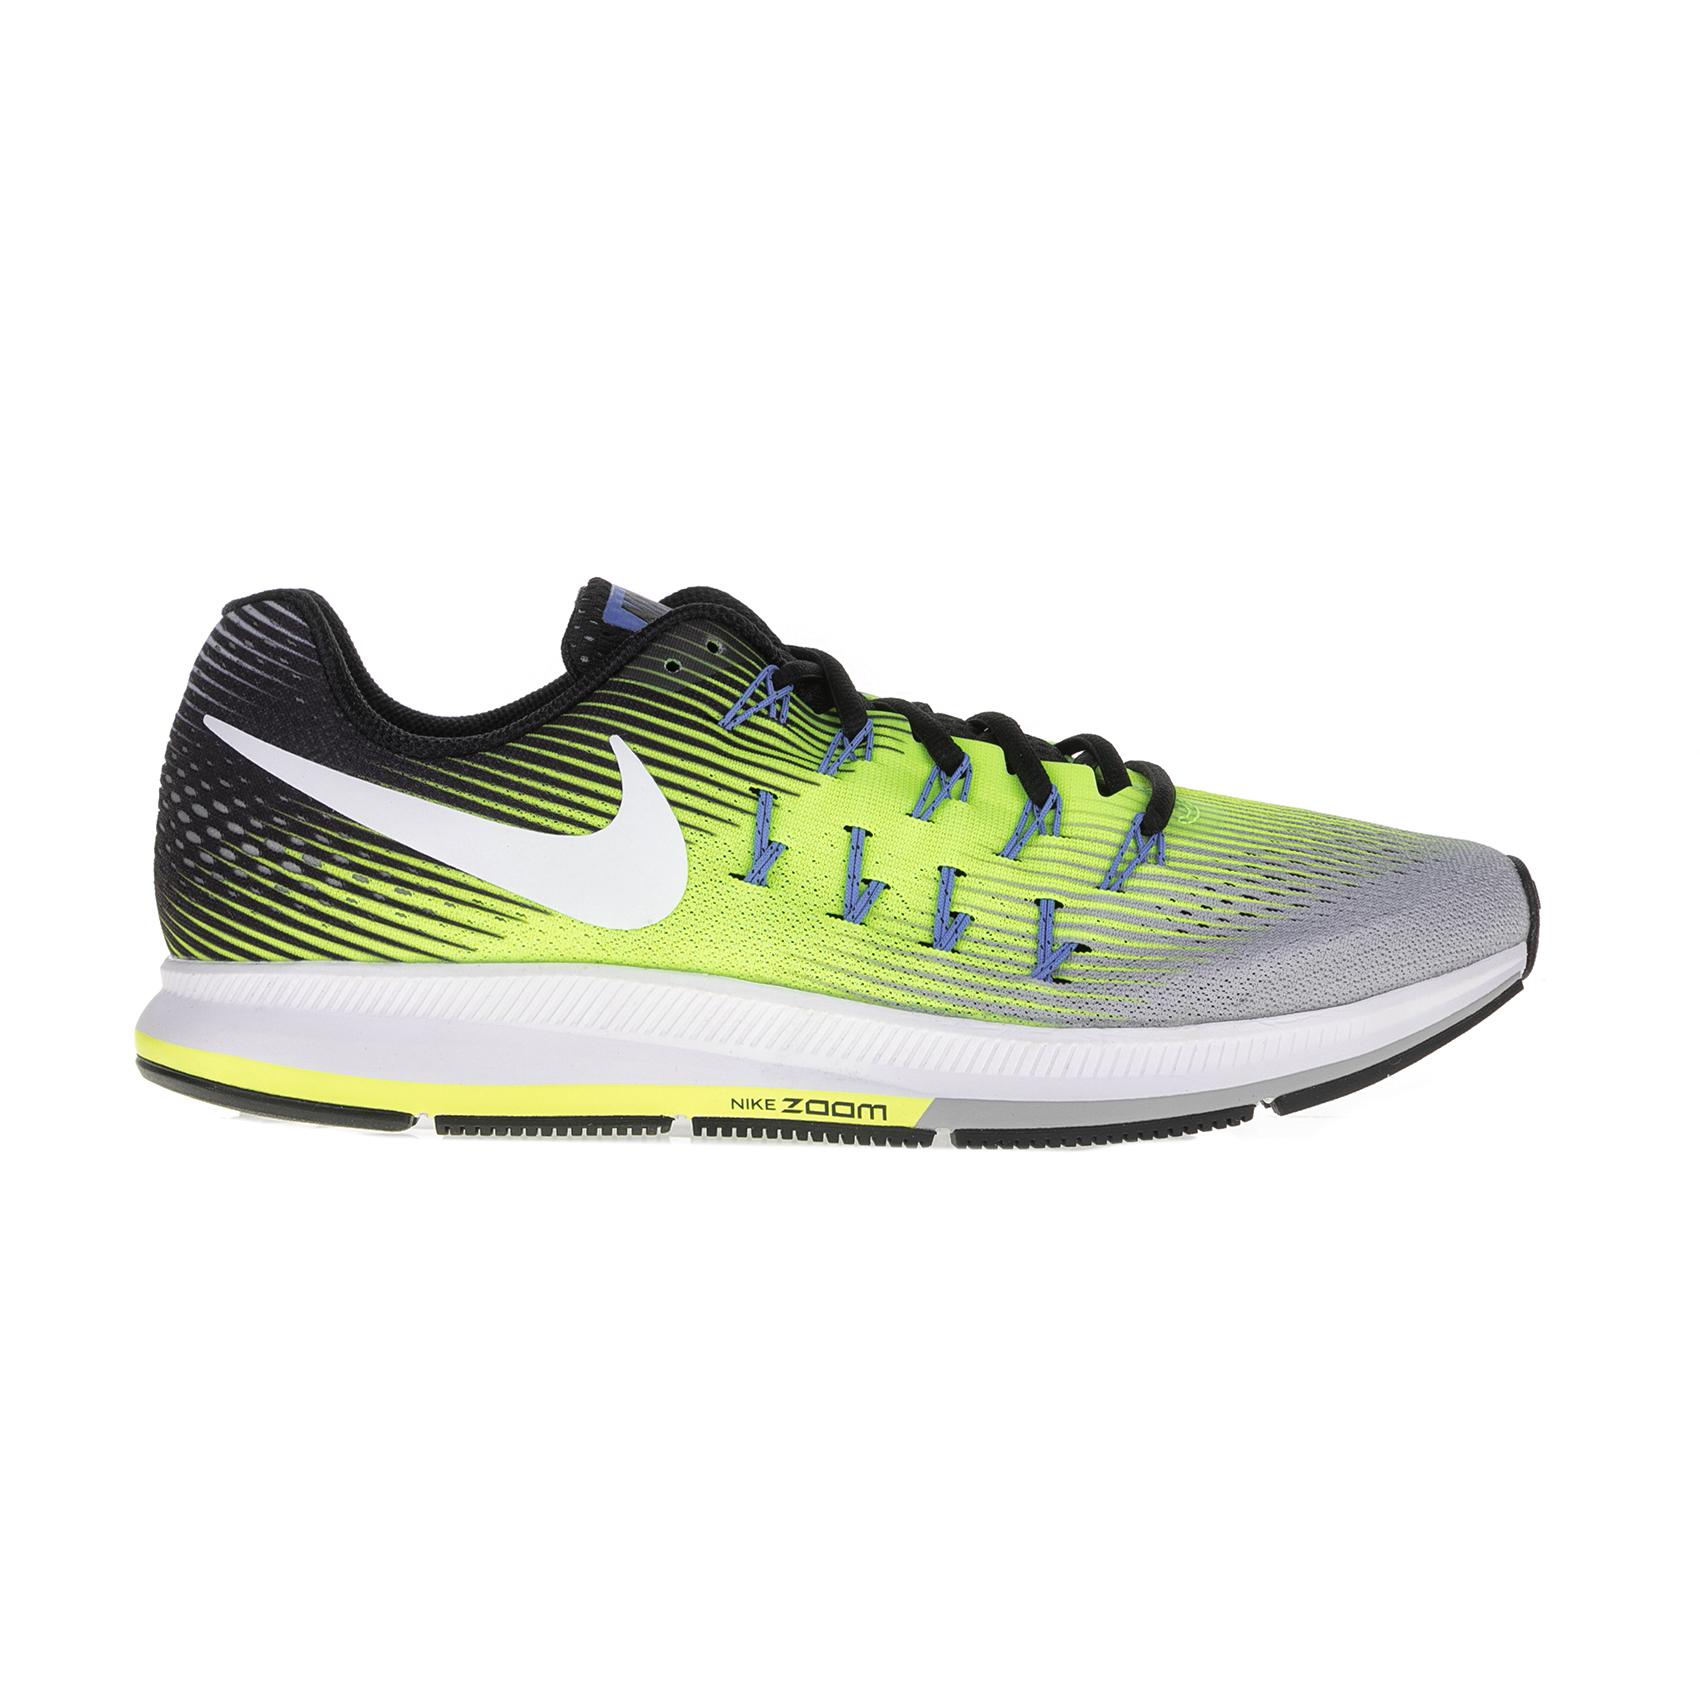 NIKE – Ανδρικά αθλητικά παπούτσια Nike AIR ZOOM PEGASUS 33 κίτρινα – μαύρα